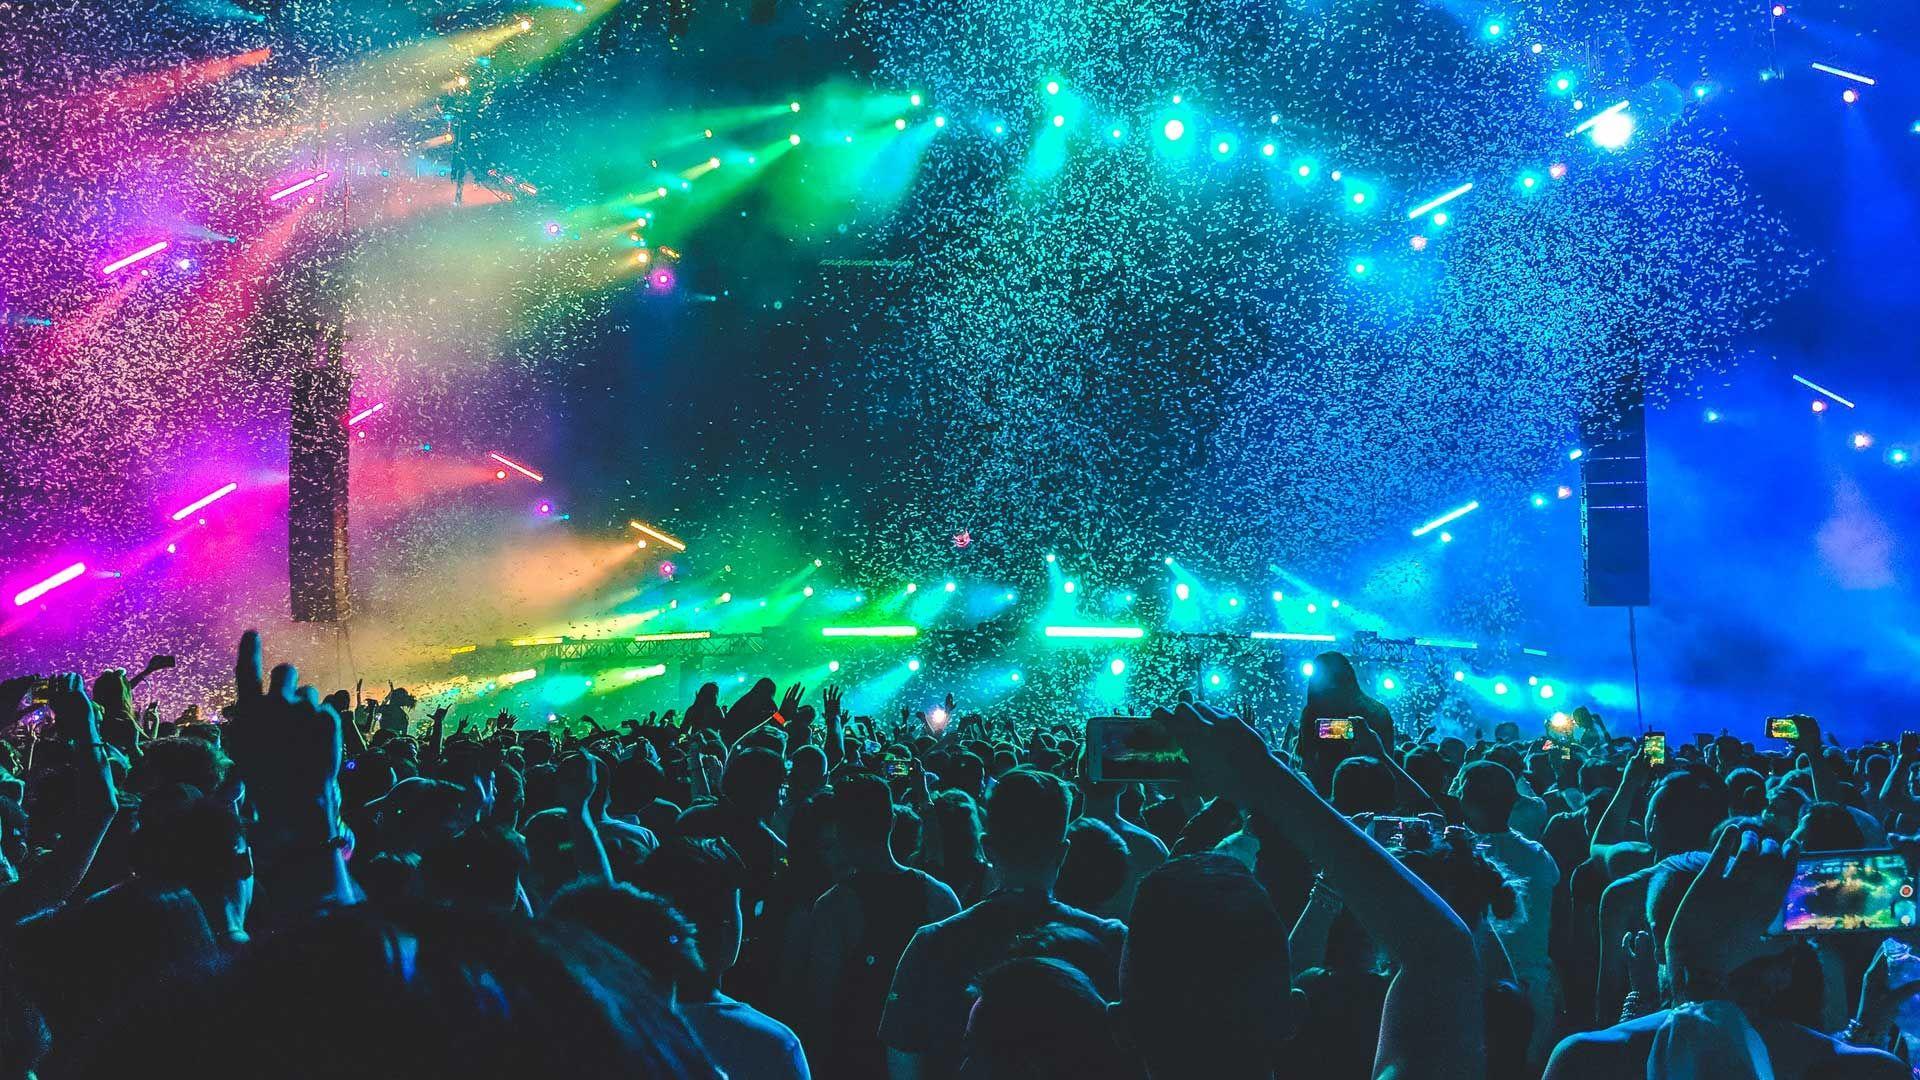 Concert beautiful wallpaper